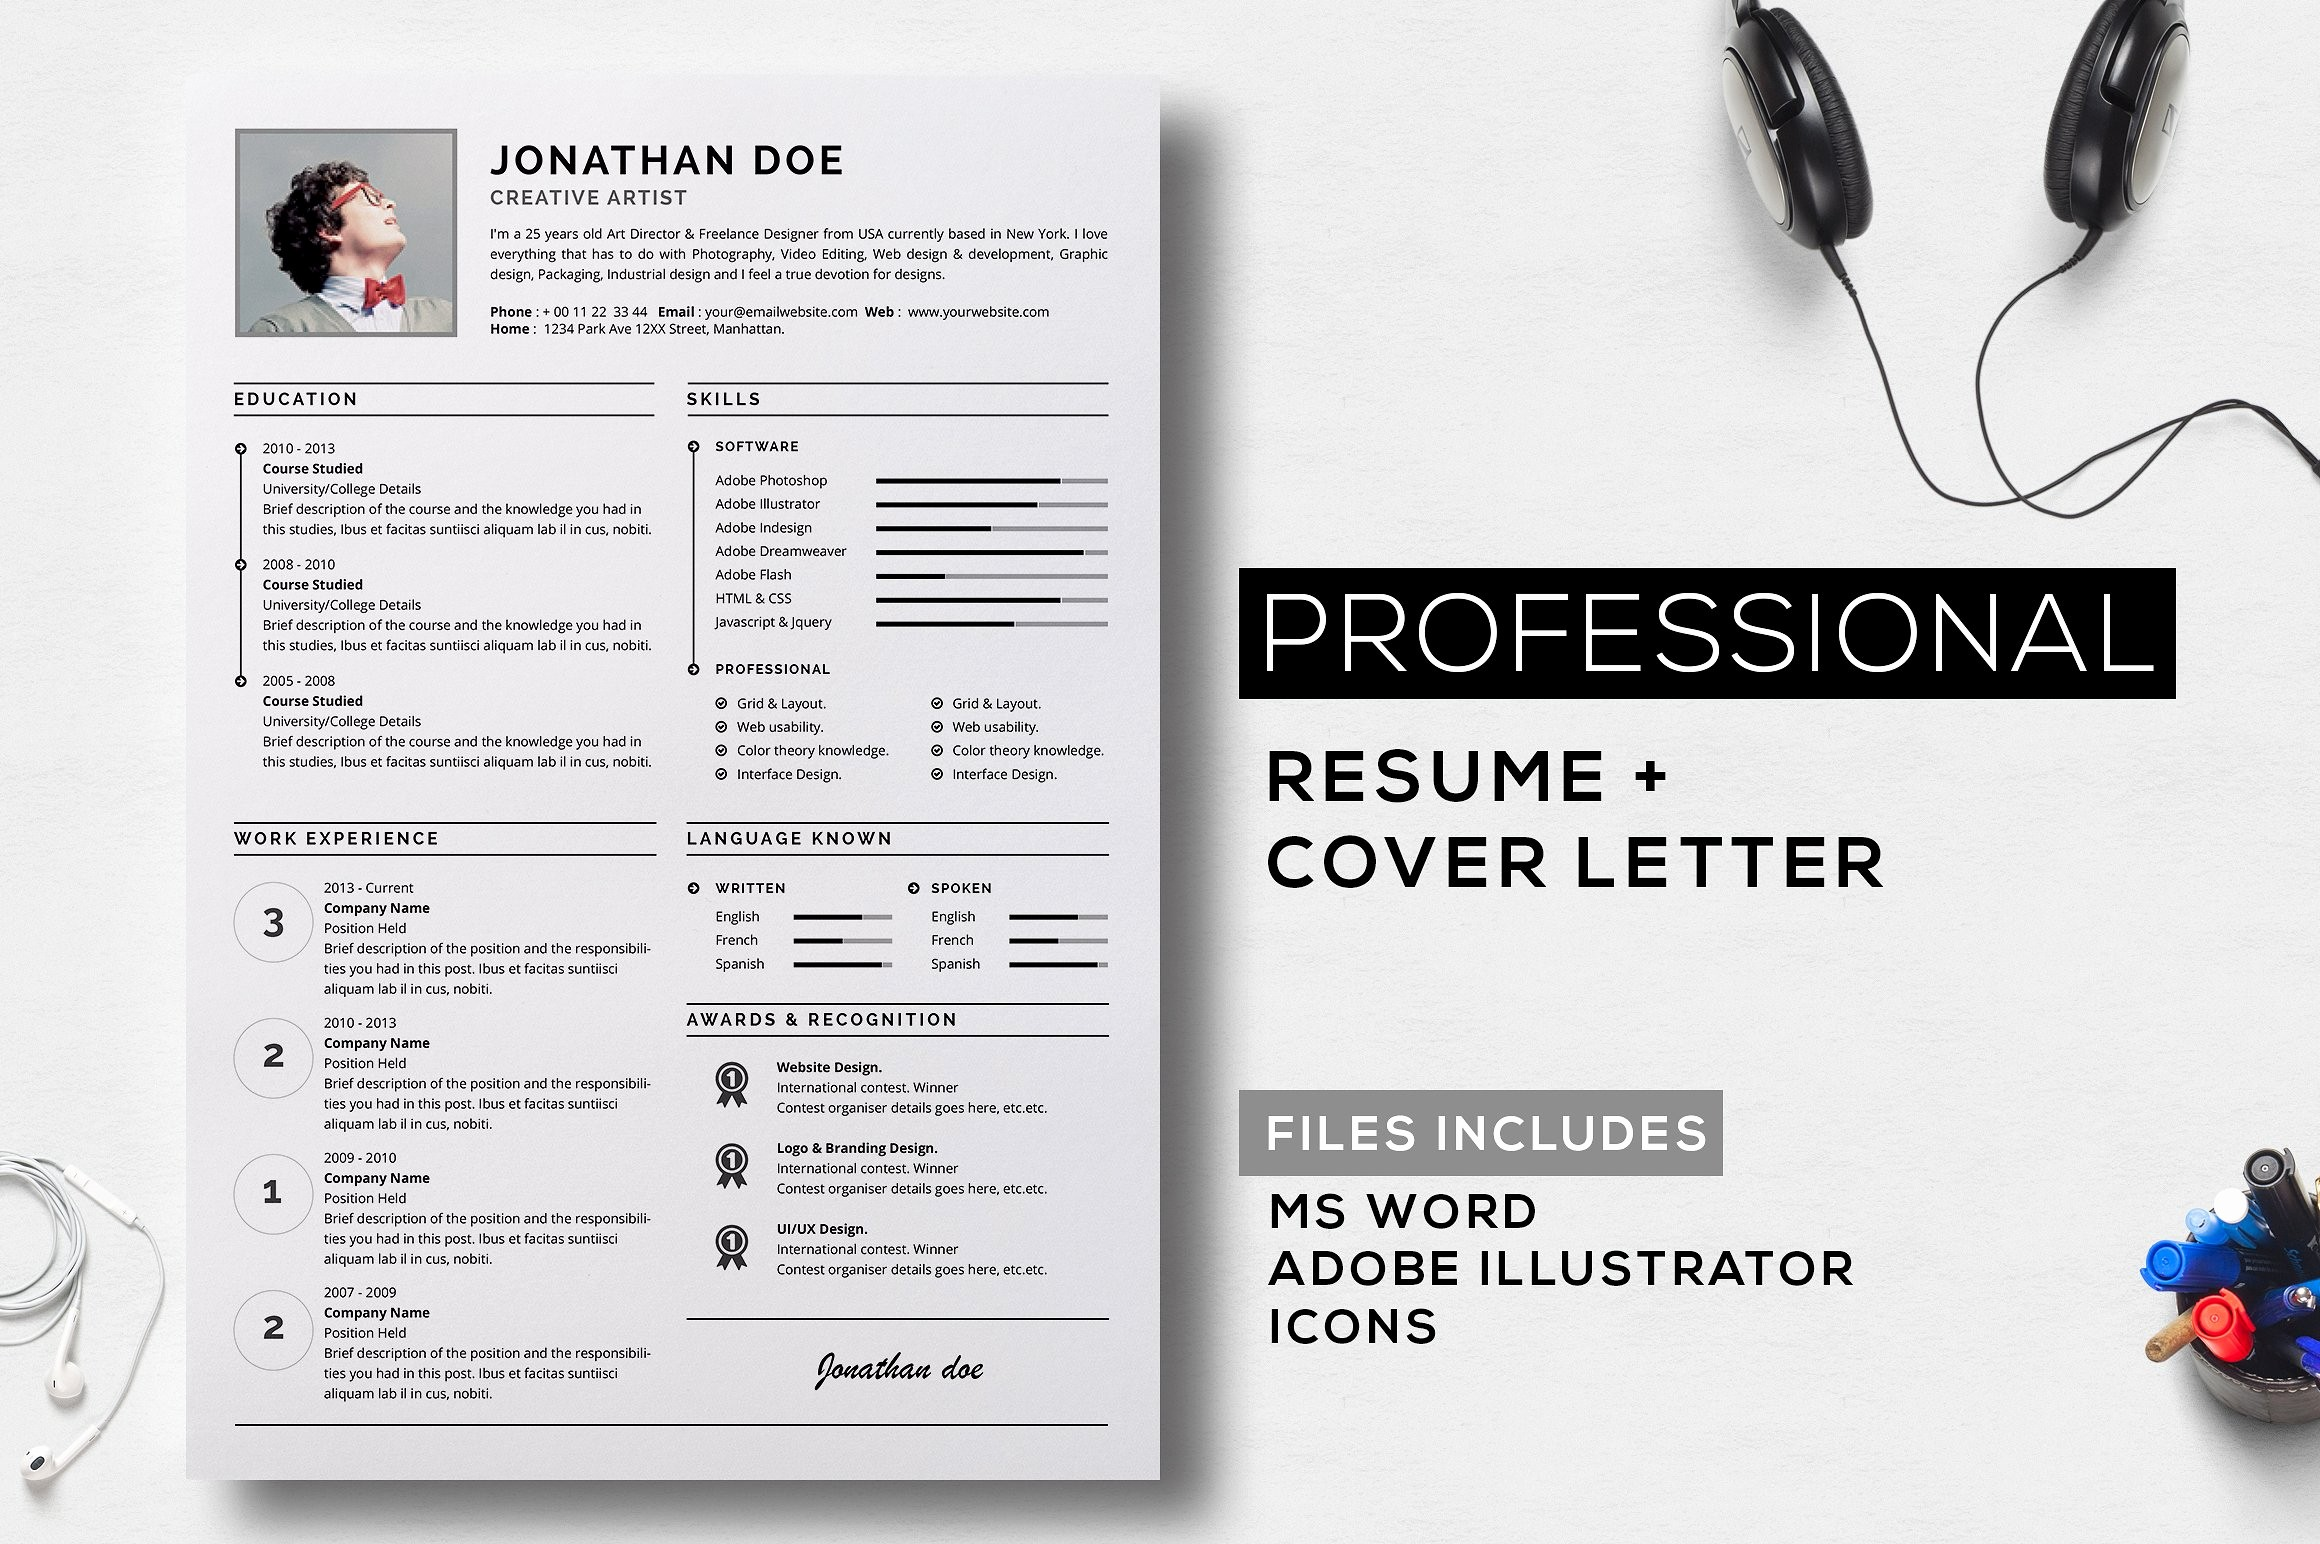 Professional Cover Letters for Resume Elegant Professional Resume Cover Letter Resume Templates